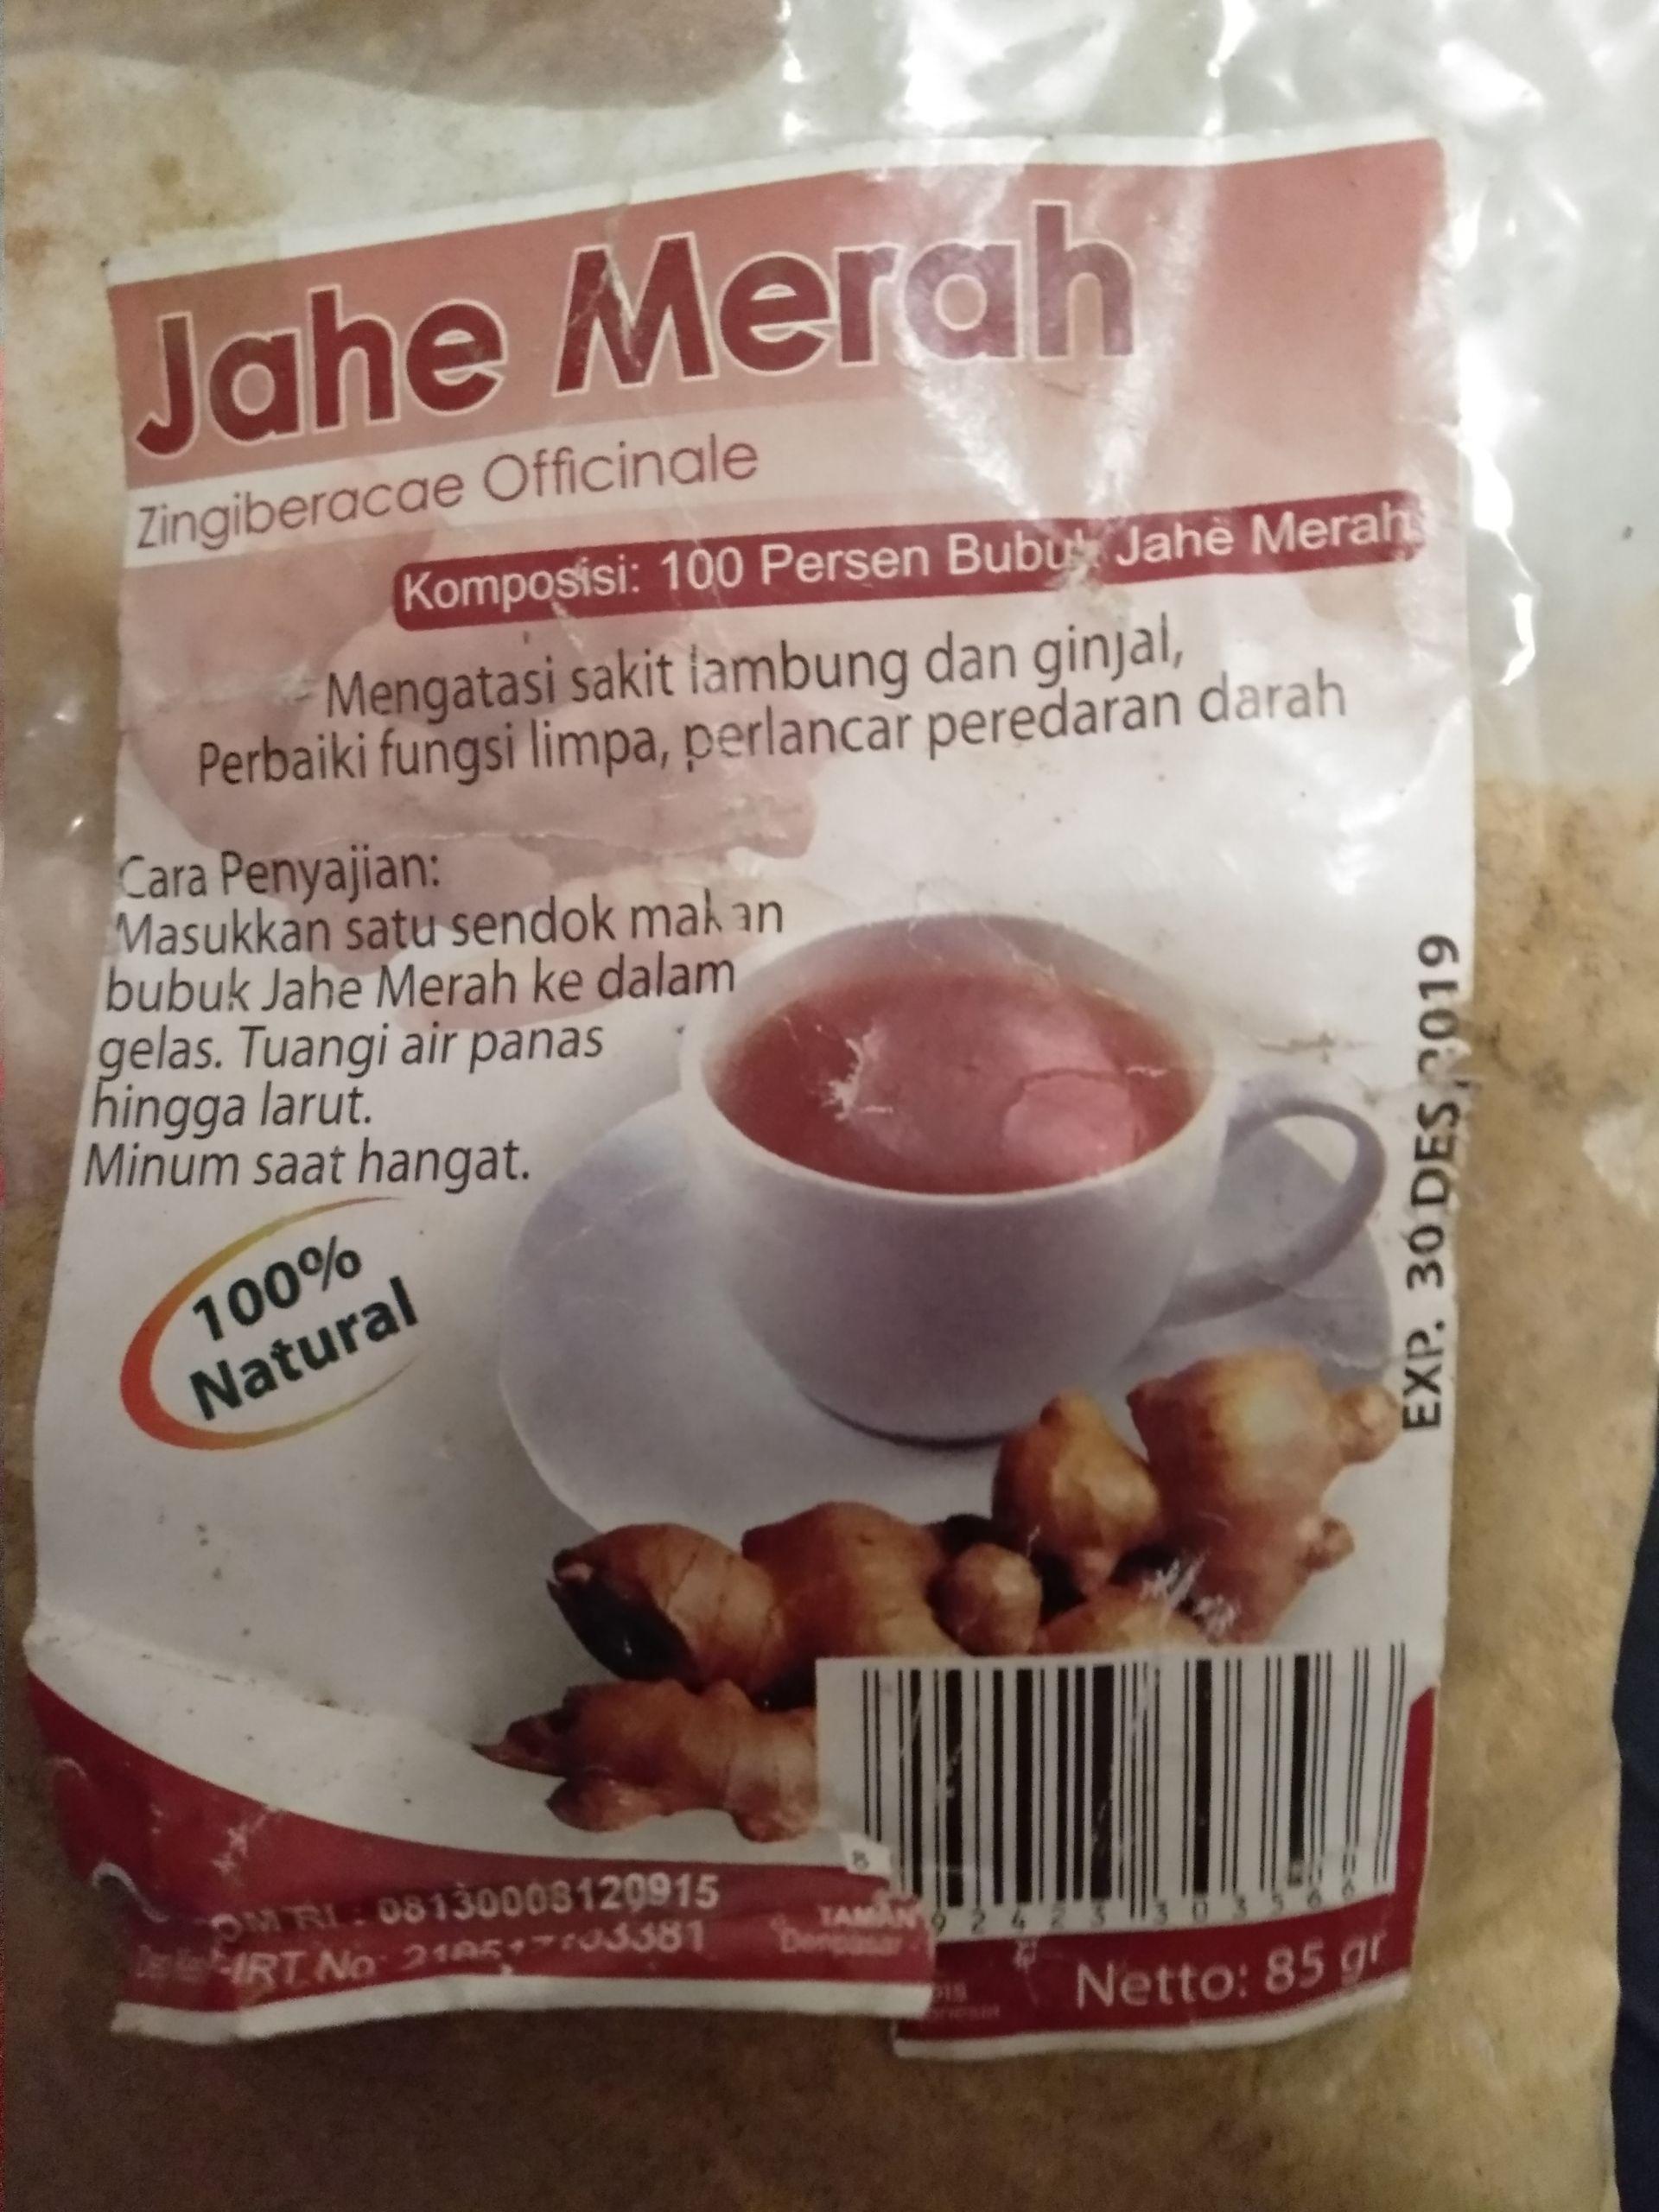 красный имбирь(jahe mirah)